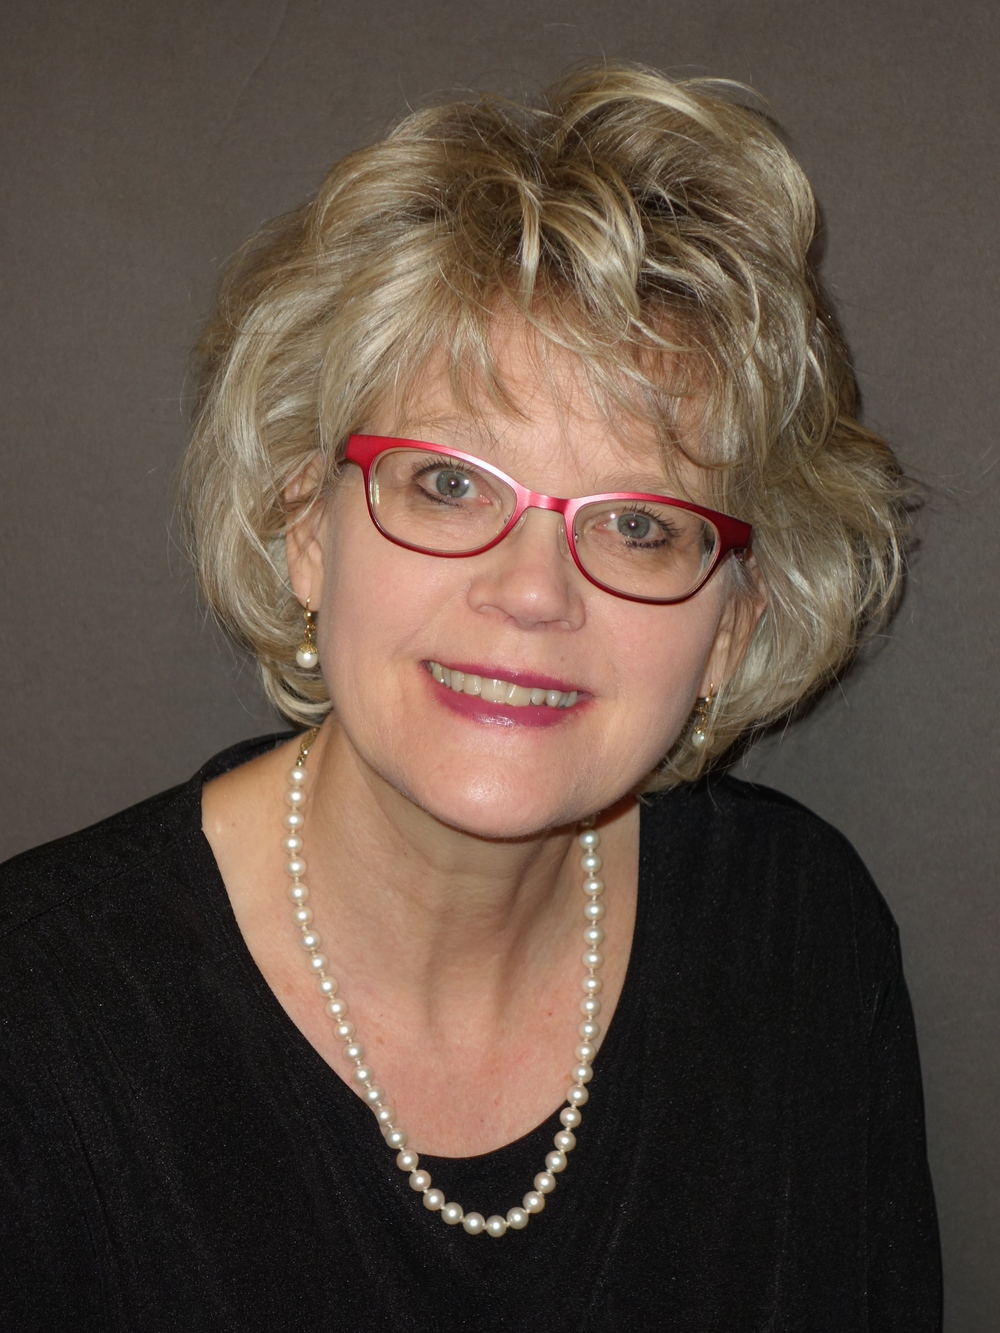 Molly Olson